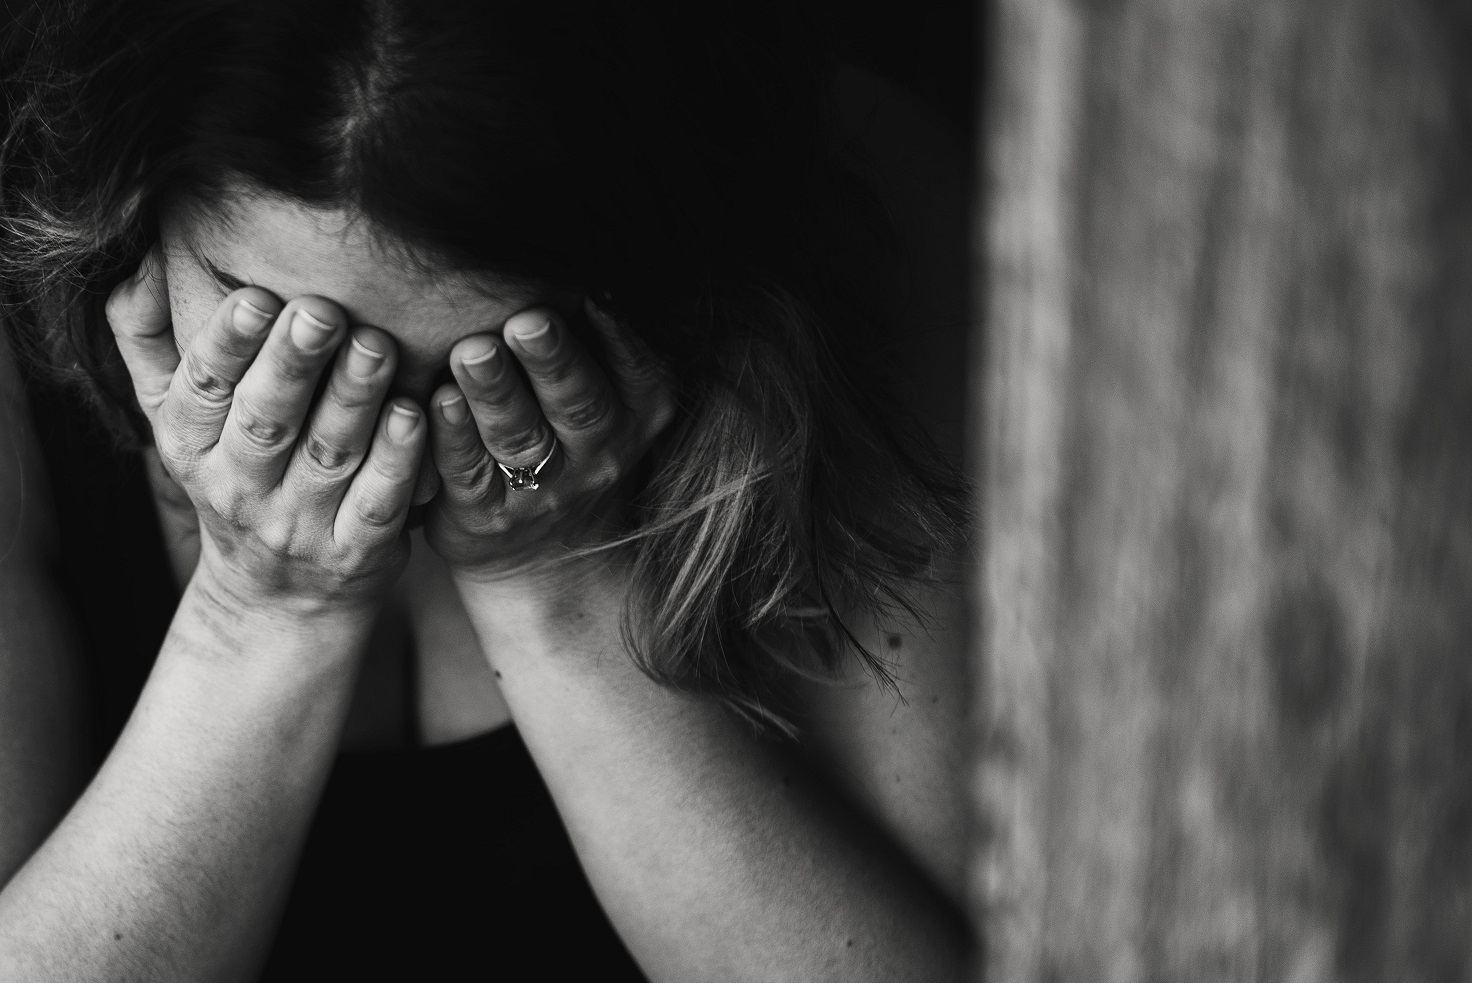 tristesse depression